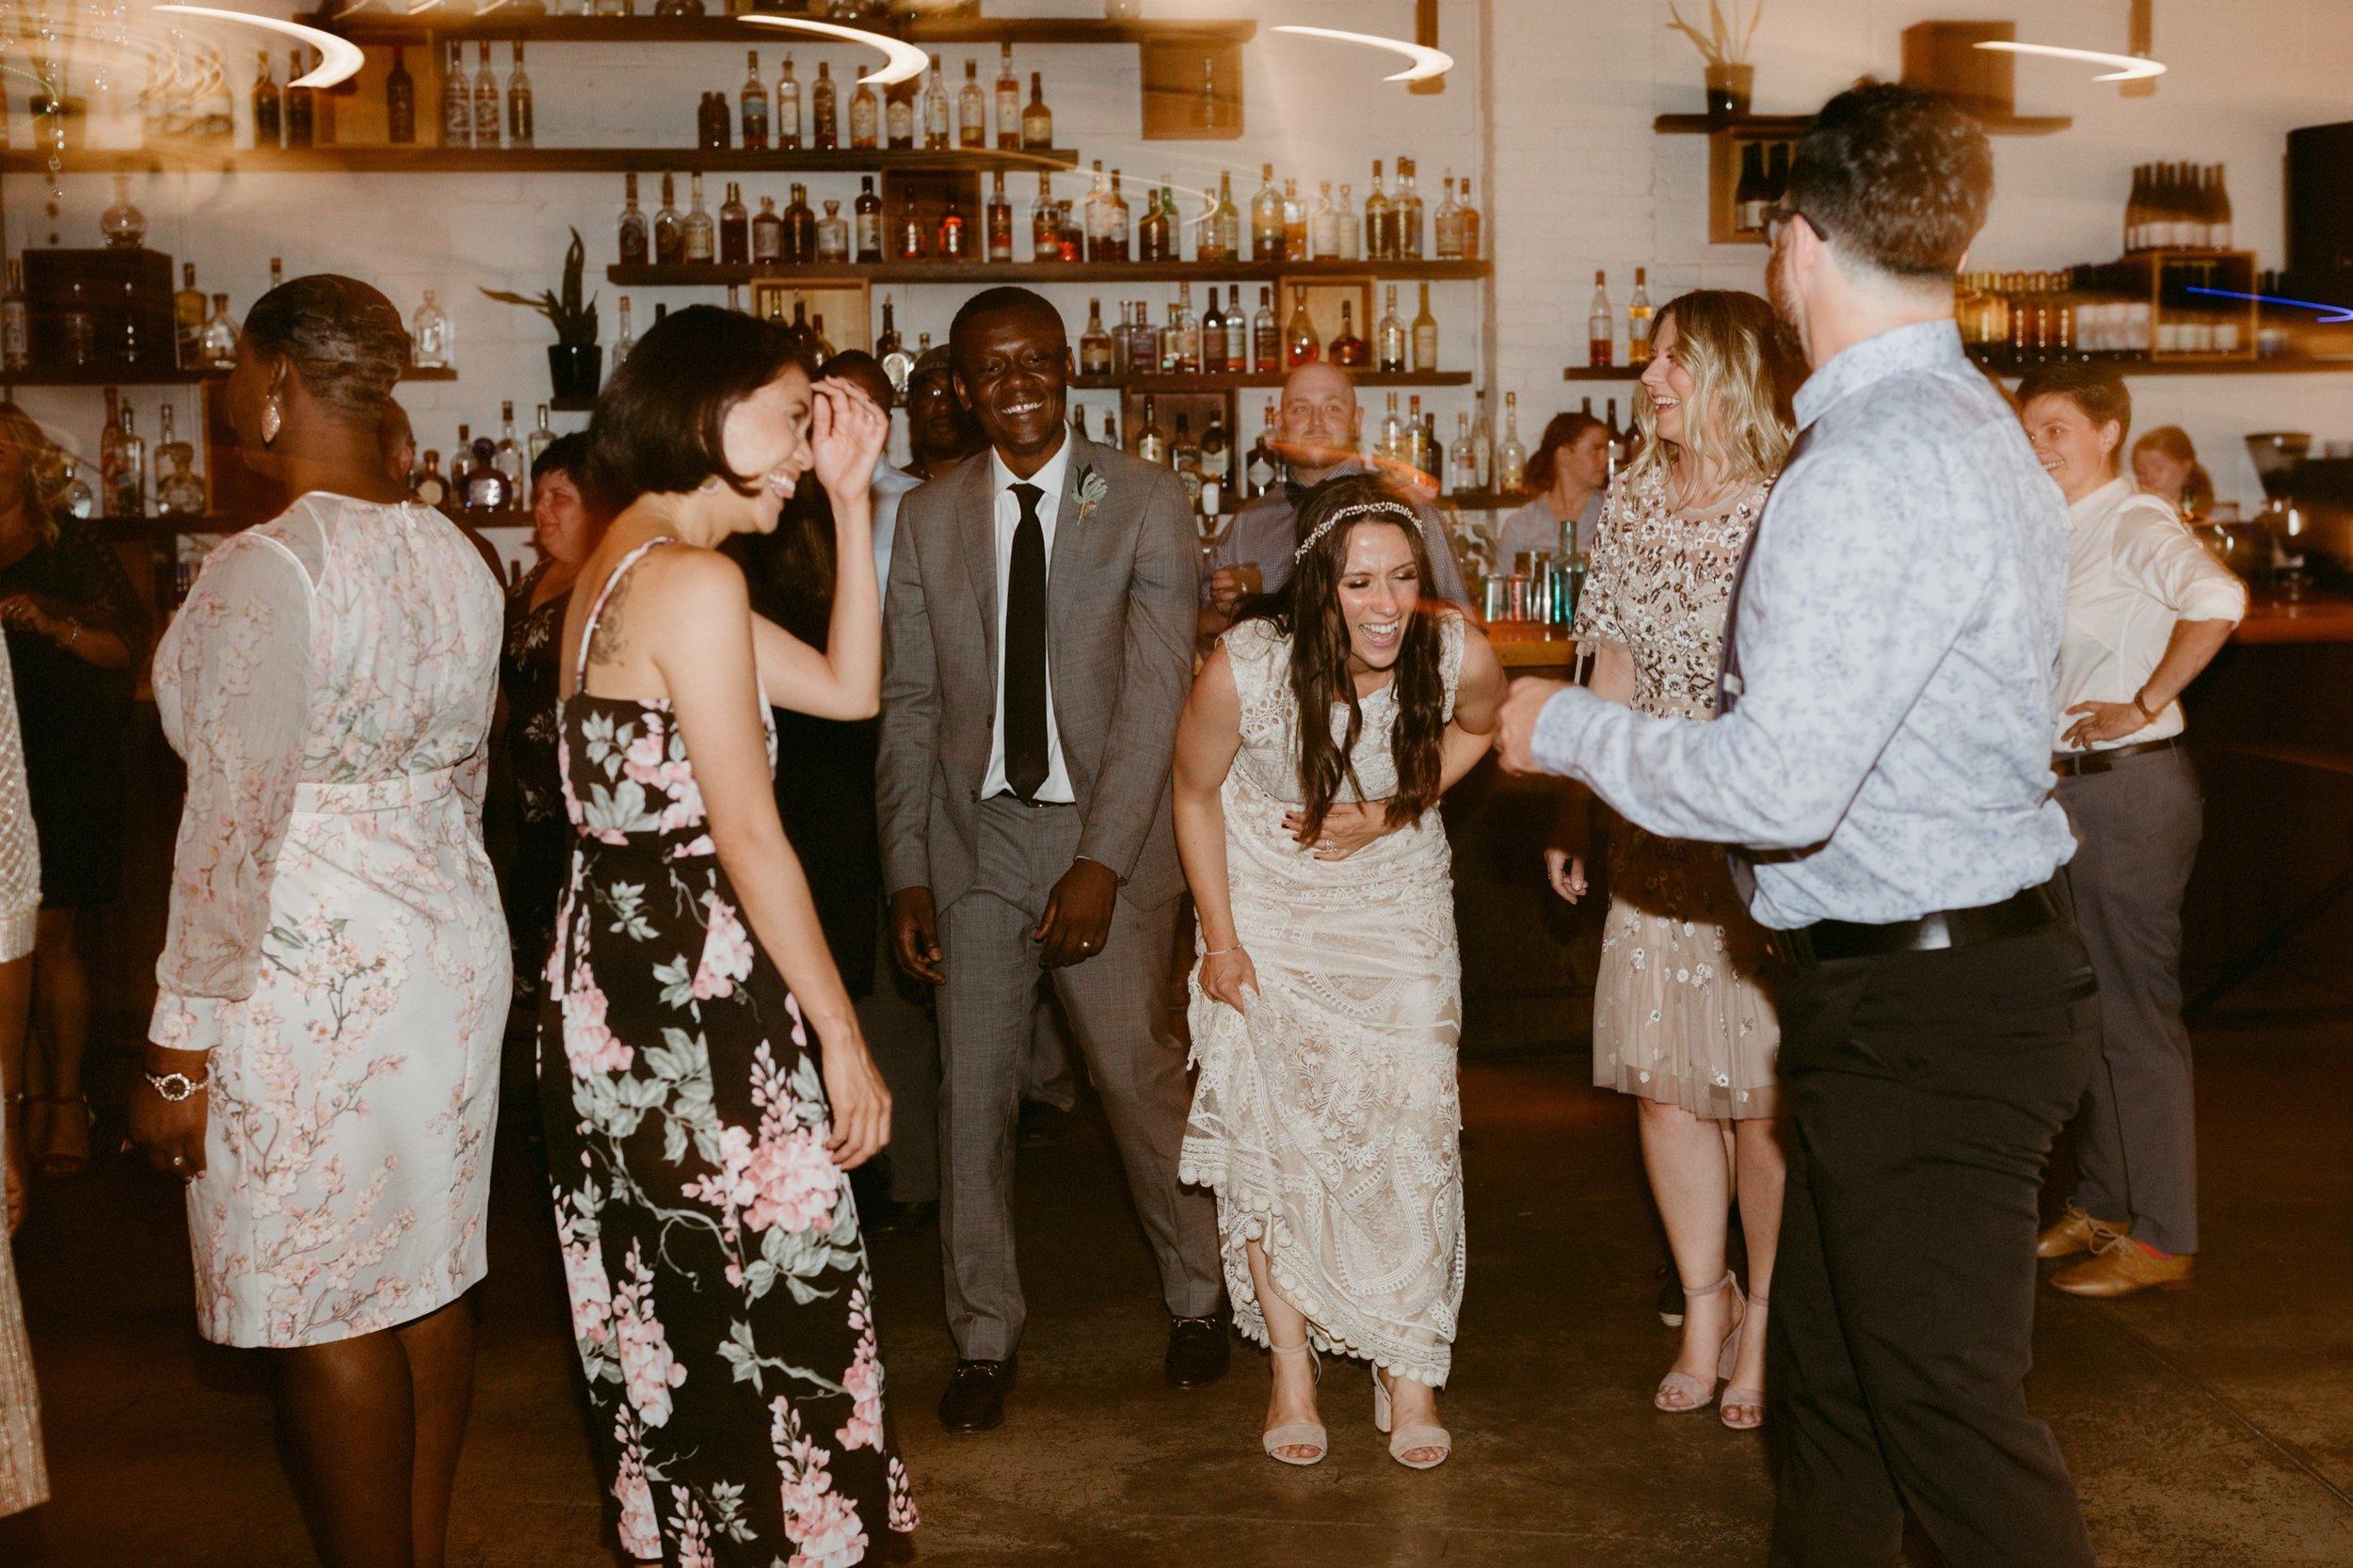 125_Spadina House Wedding (726 of 748)_intimate_Boehmer_Restaurant_Toronto_Wedding.jpg